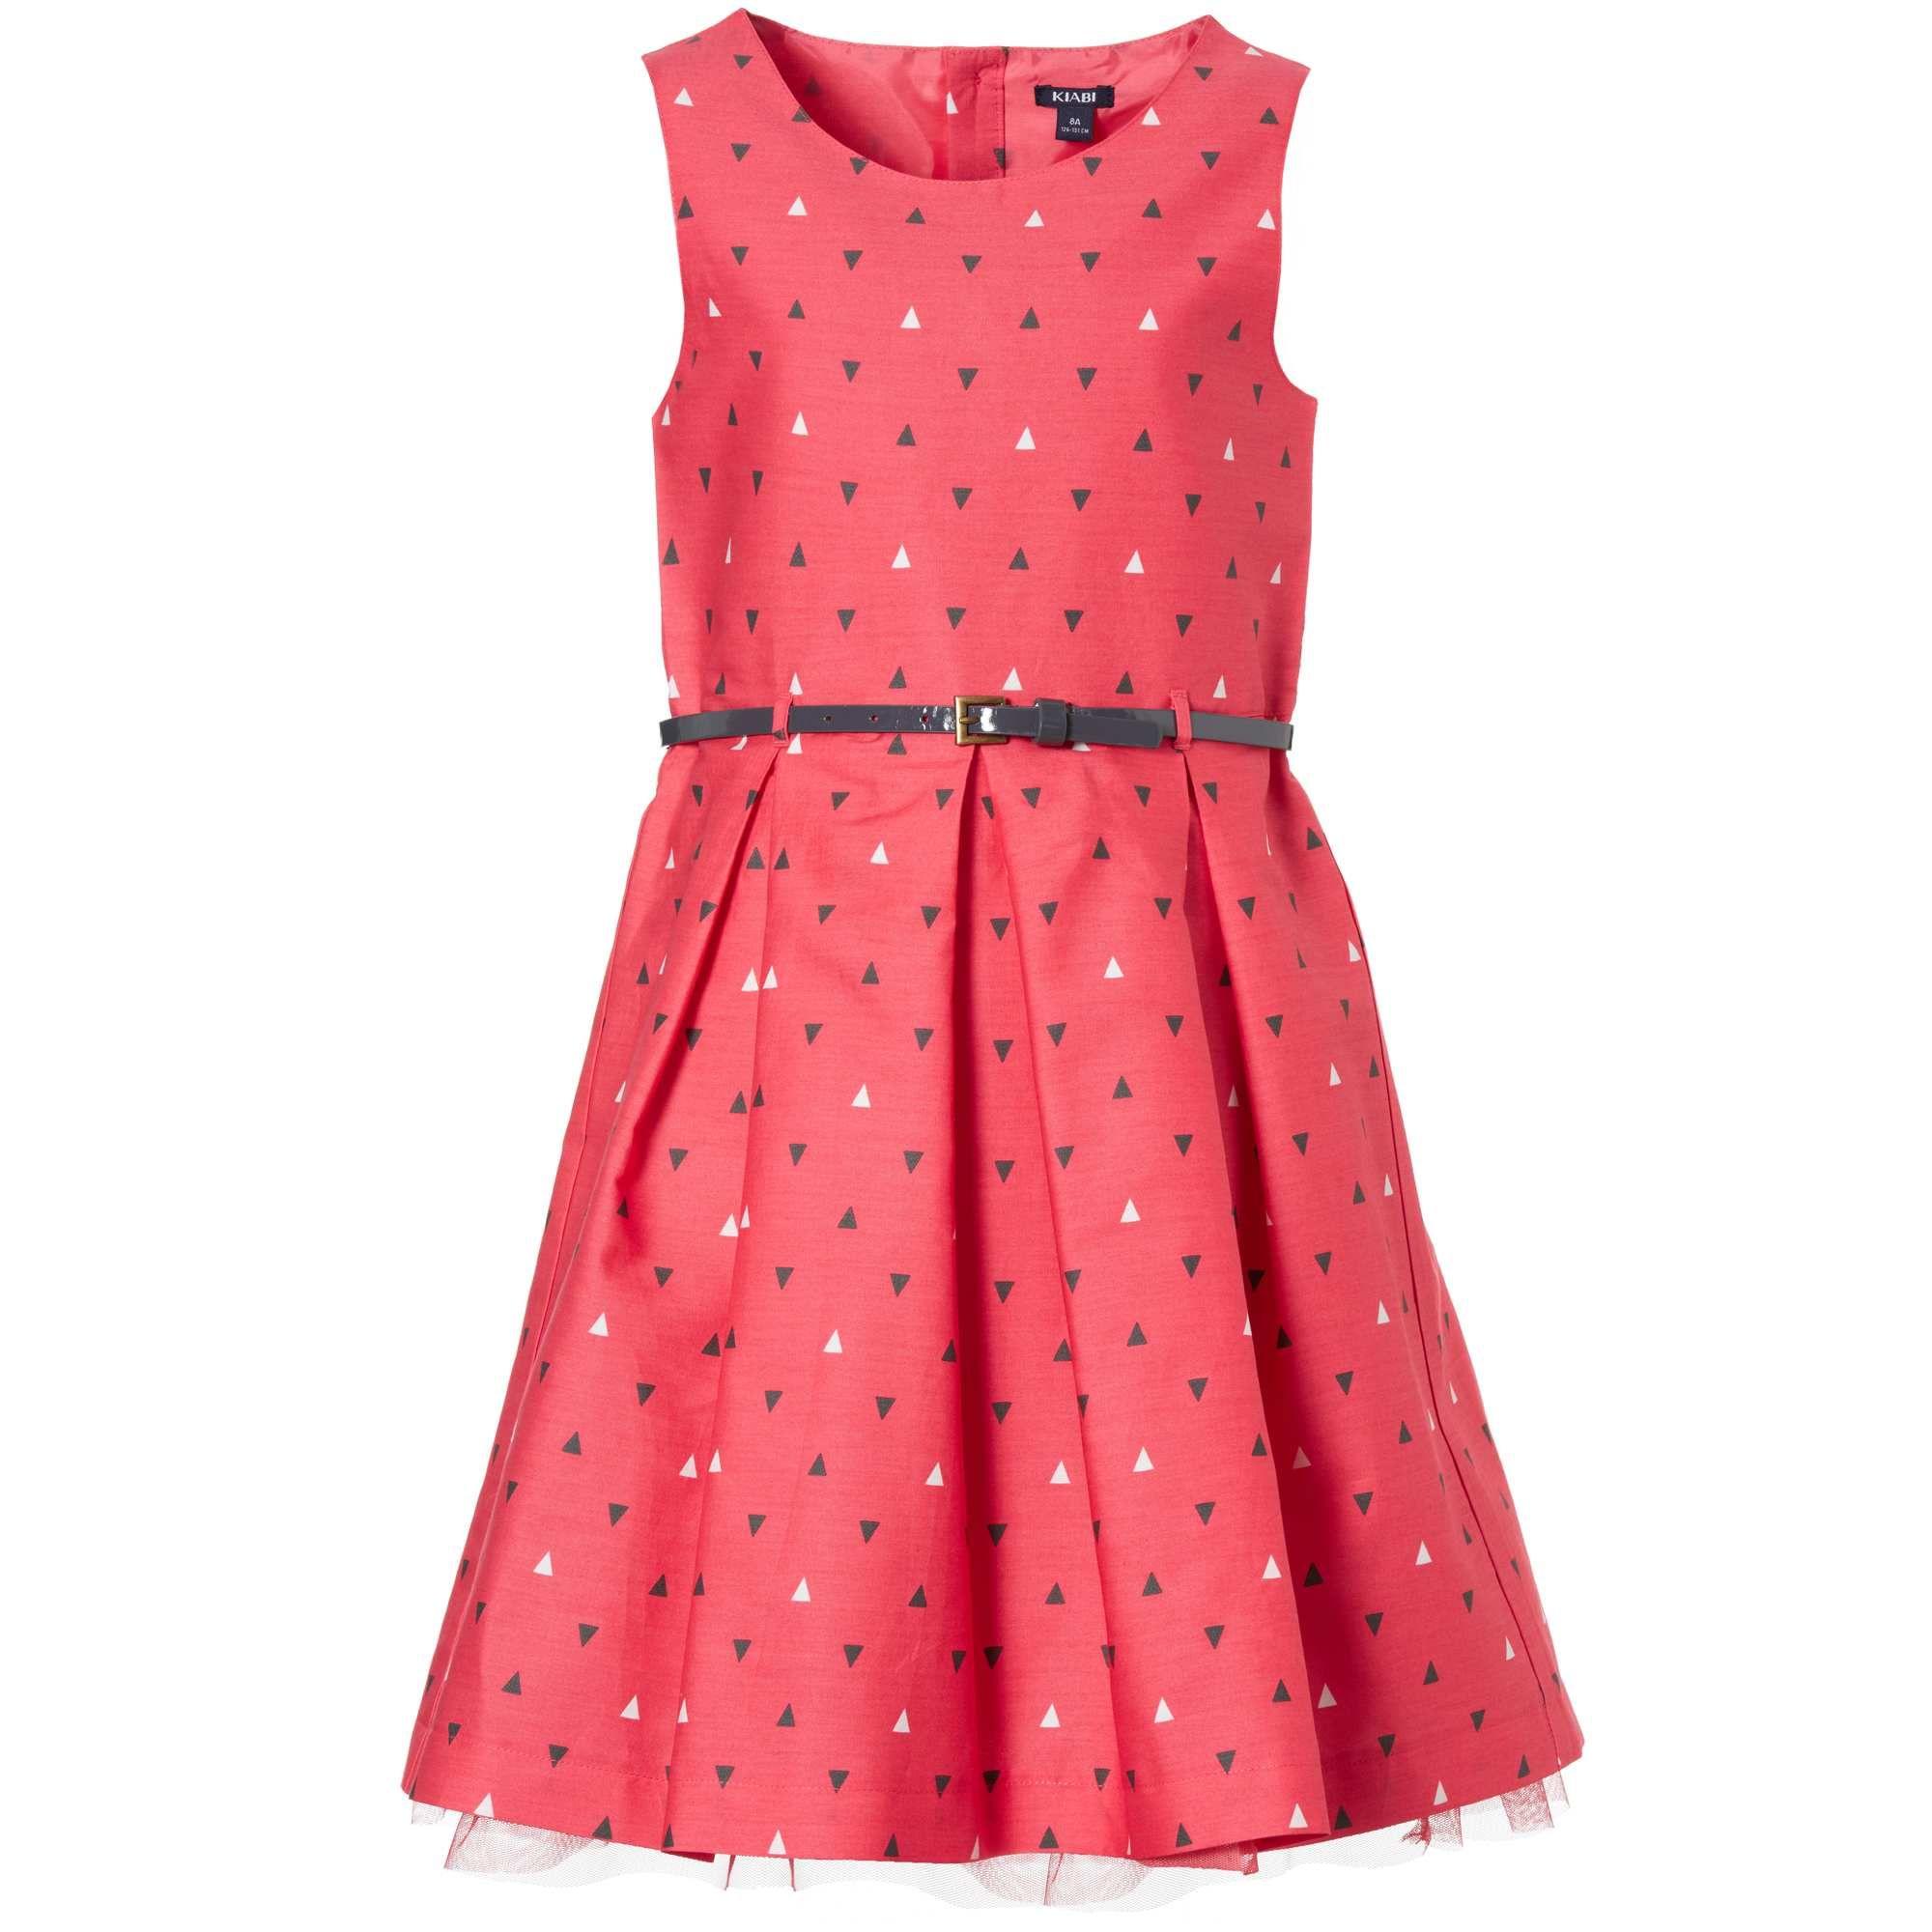 robe c r monie doublure tulle fille kiabi 13 00 style mode enfants pinterest robe. Black Bedroom Furniture Sets. Home Design Ideas